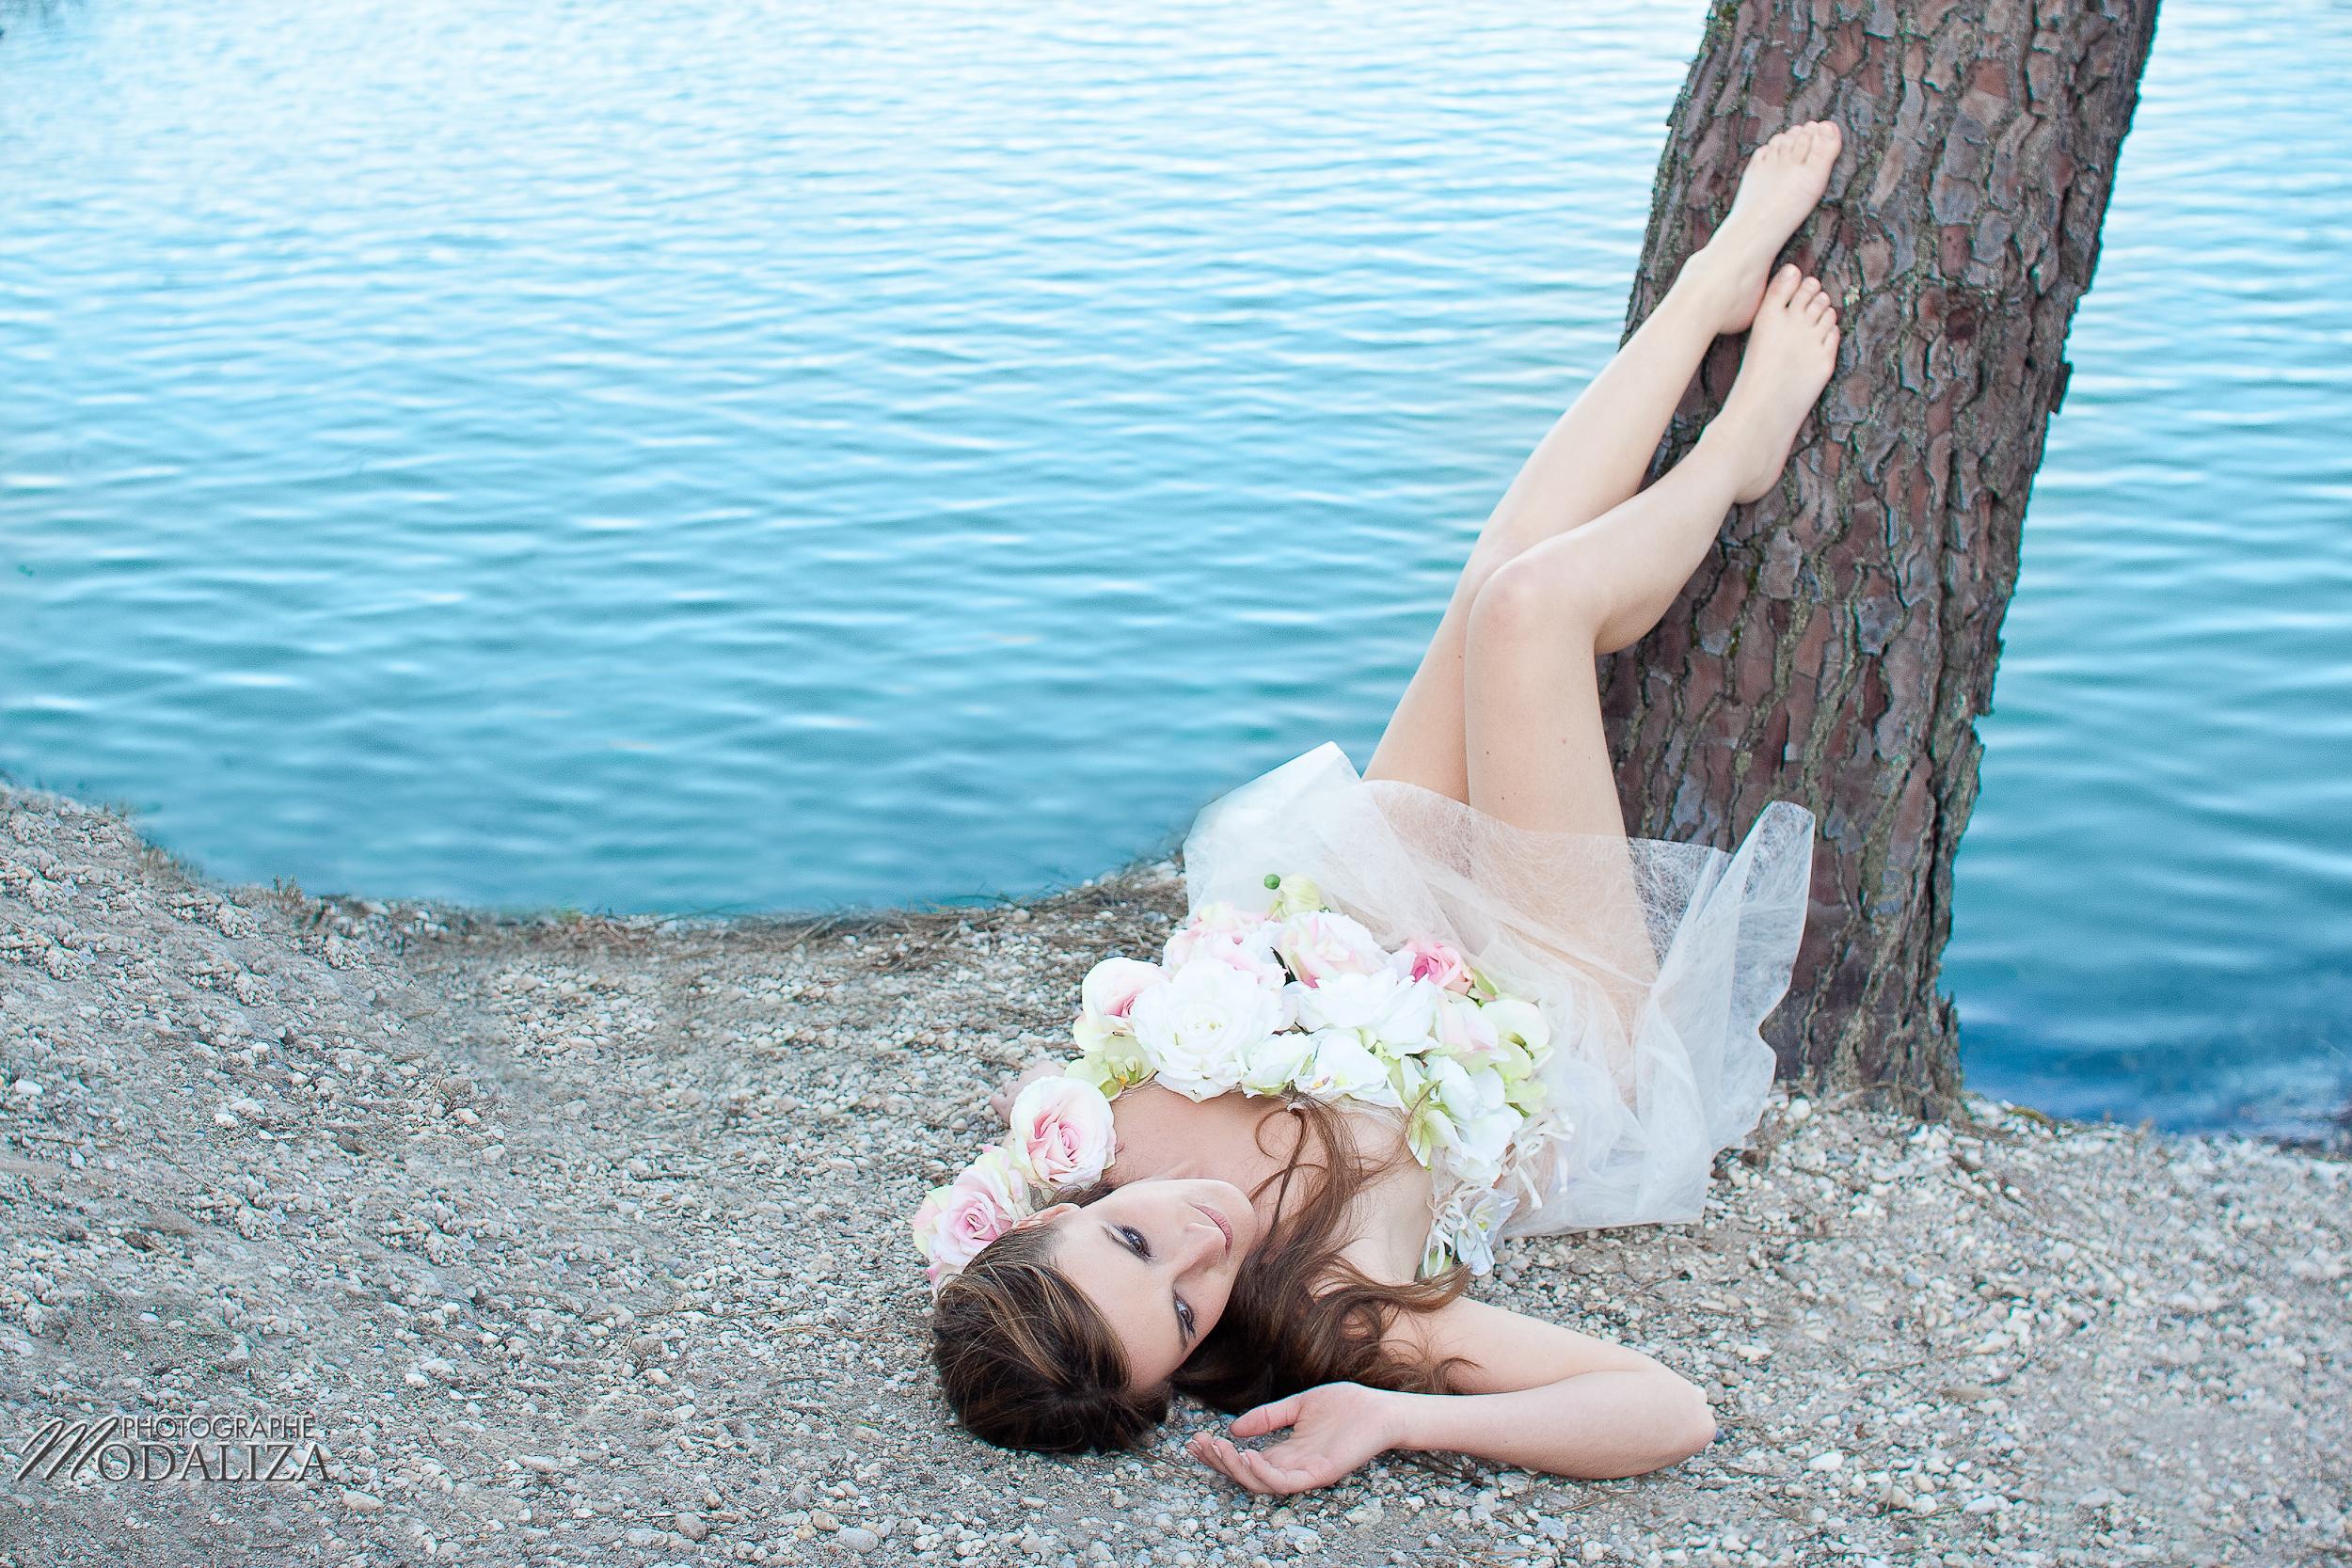 photo mariee inspiration shoot mode nature robe fleur confidentiel tendance mariage gironde bordeaux mariee en colere by modaliza -0251